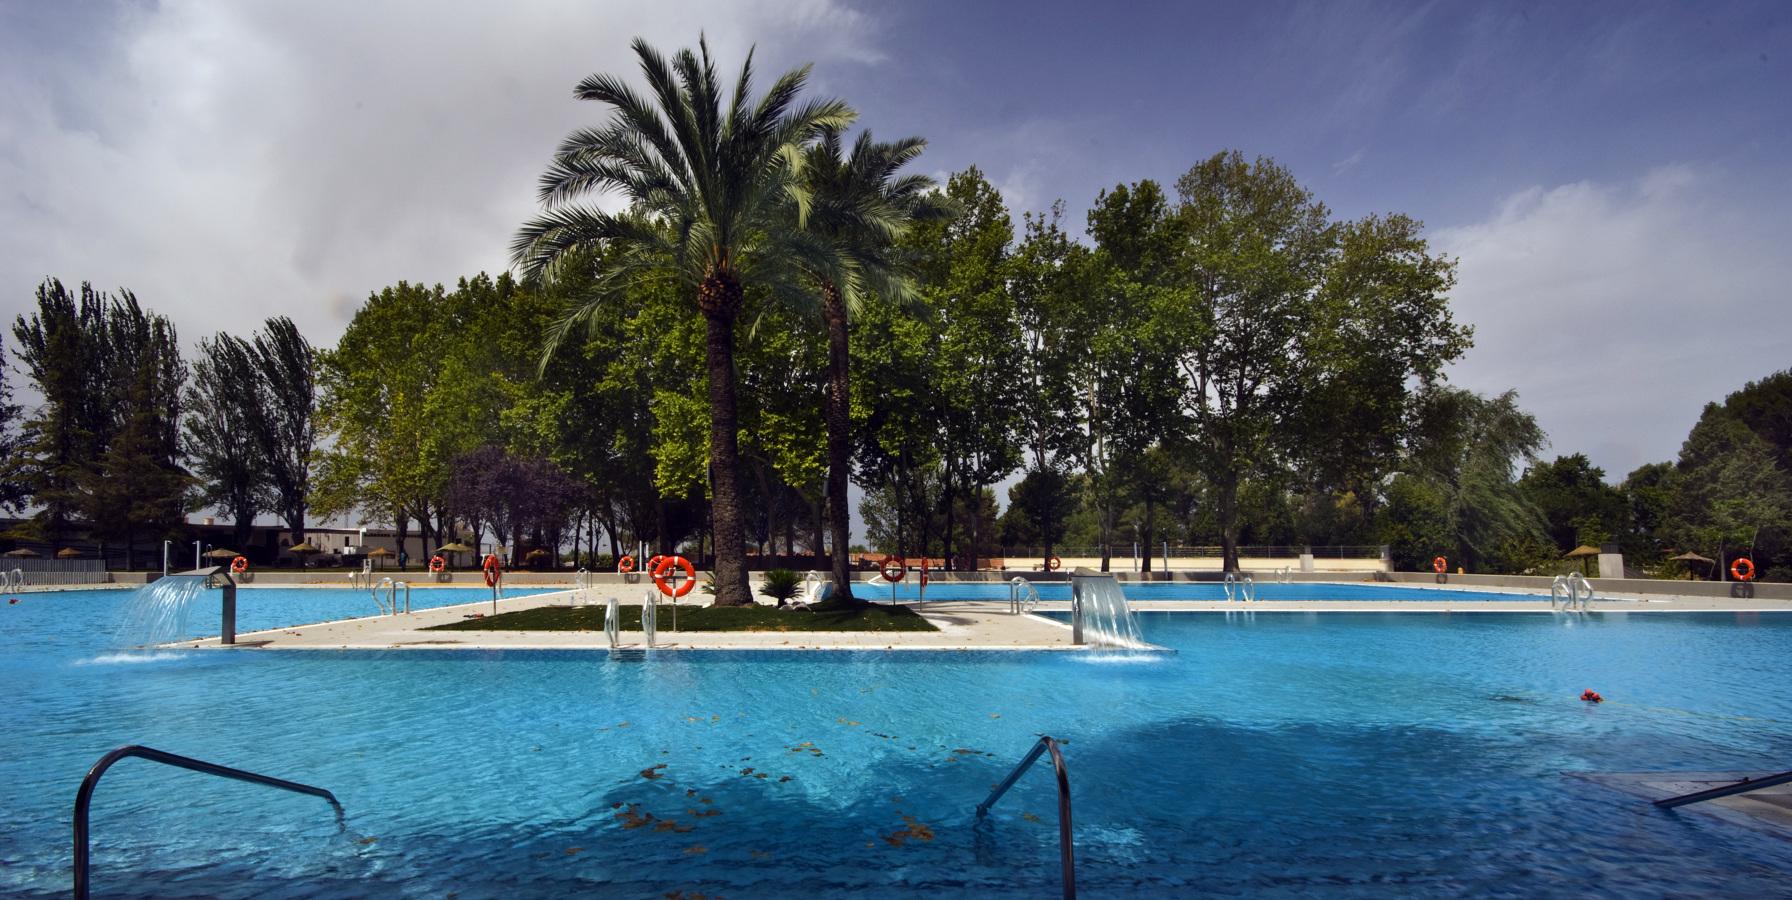 Piscina montilla ideas reformas piscinas for Piscinas jardin cordoba